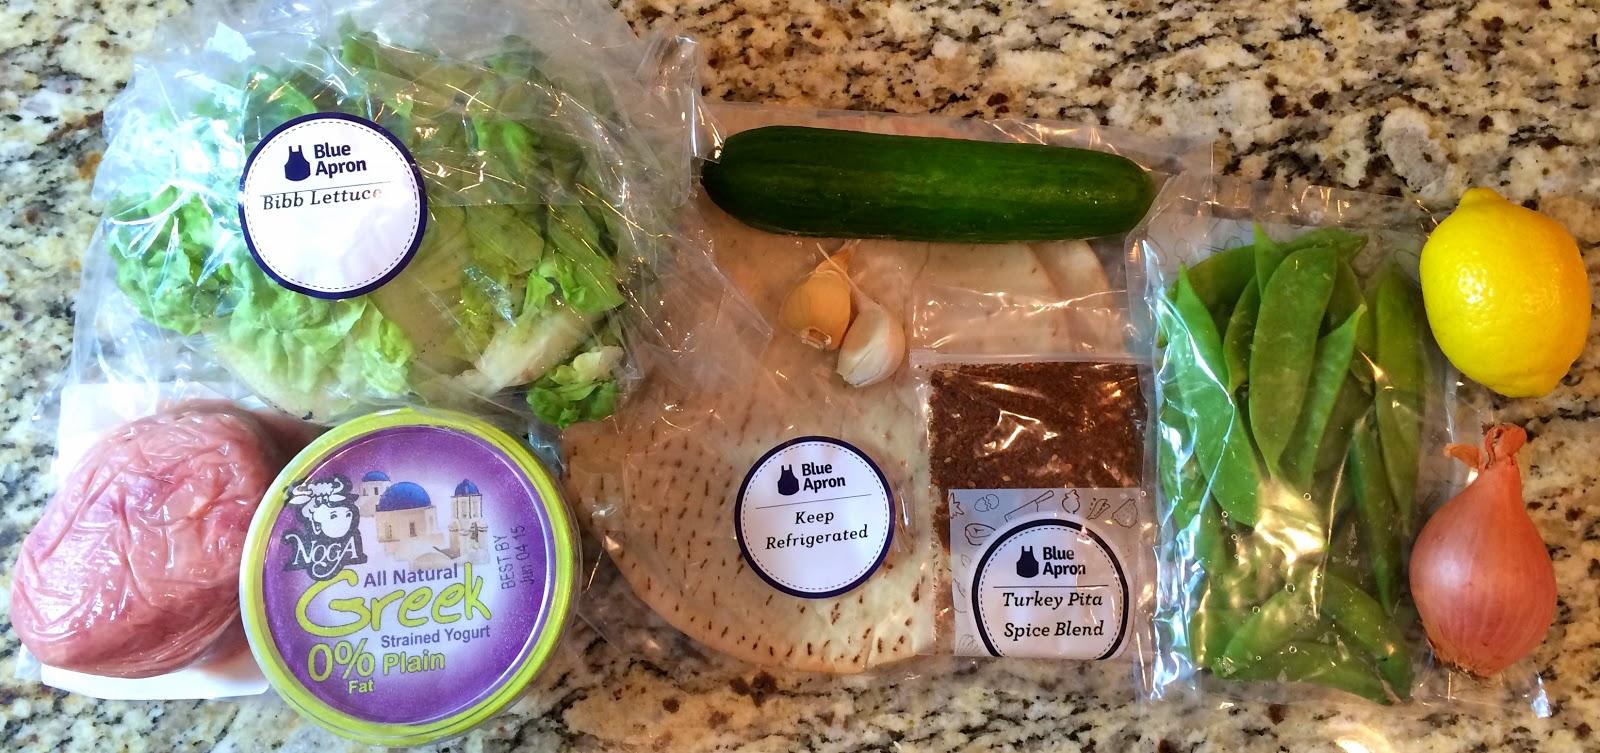 Blue apron lentil spice blend - Spiced Turkey Meatball Pitas With Sugar Snap Peas Bibb Lettuce Salad